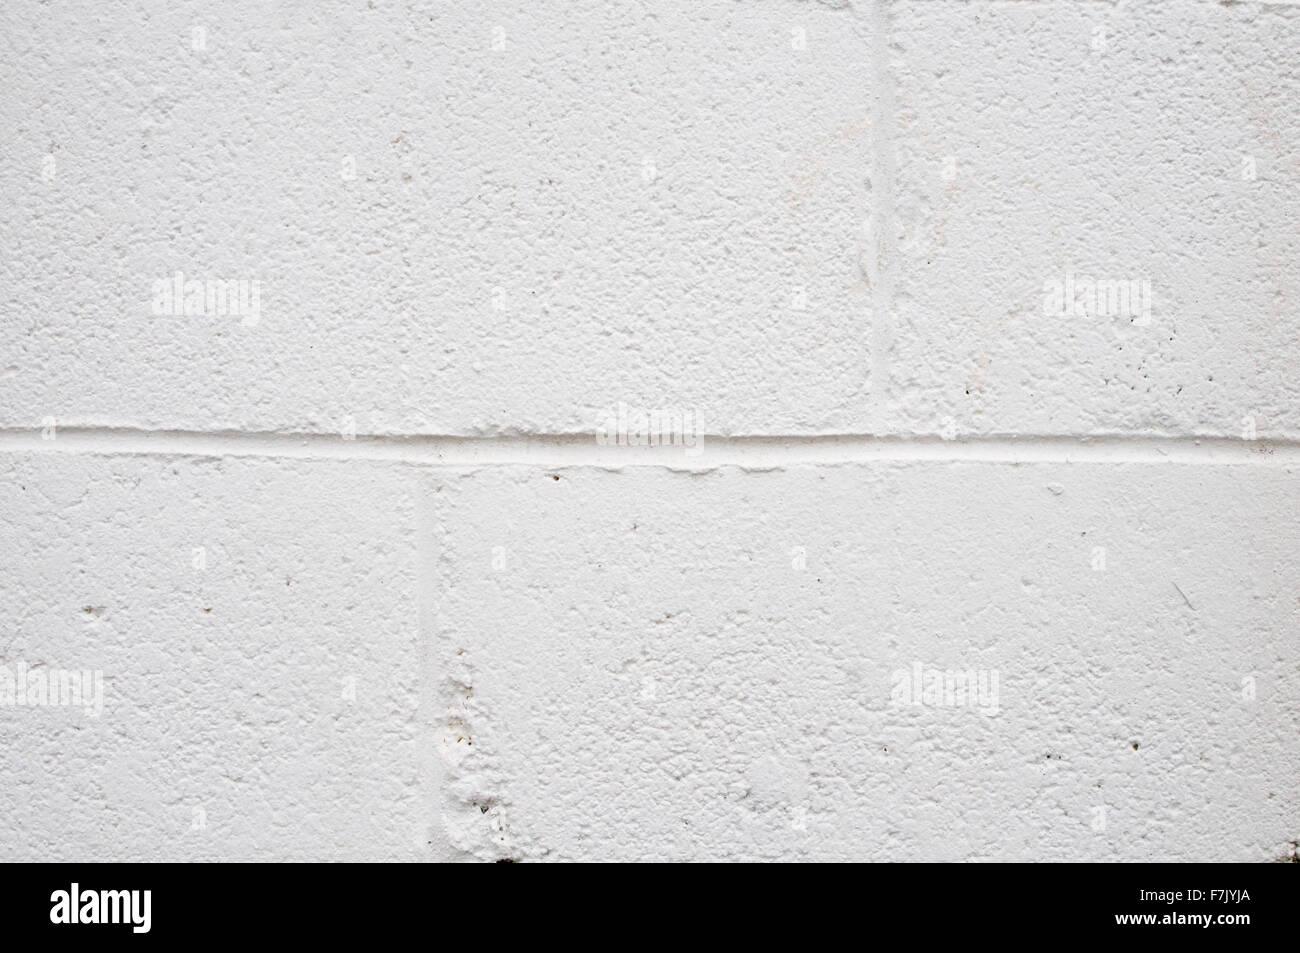 whitewash whitewashed white wash washed washing paint painted breeze block blocks breezeblock breezeblocks concrete - Stock Image